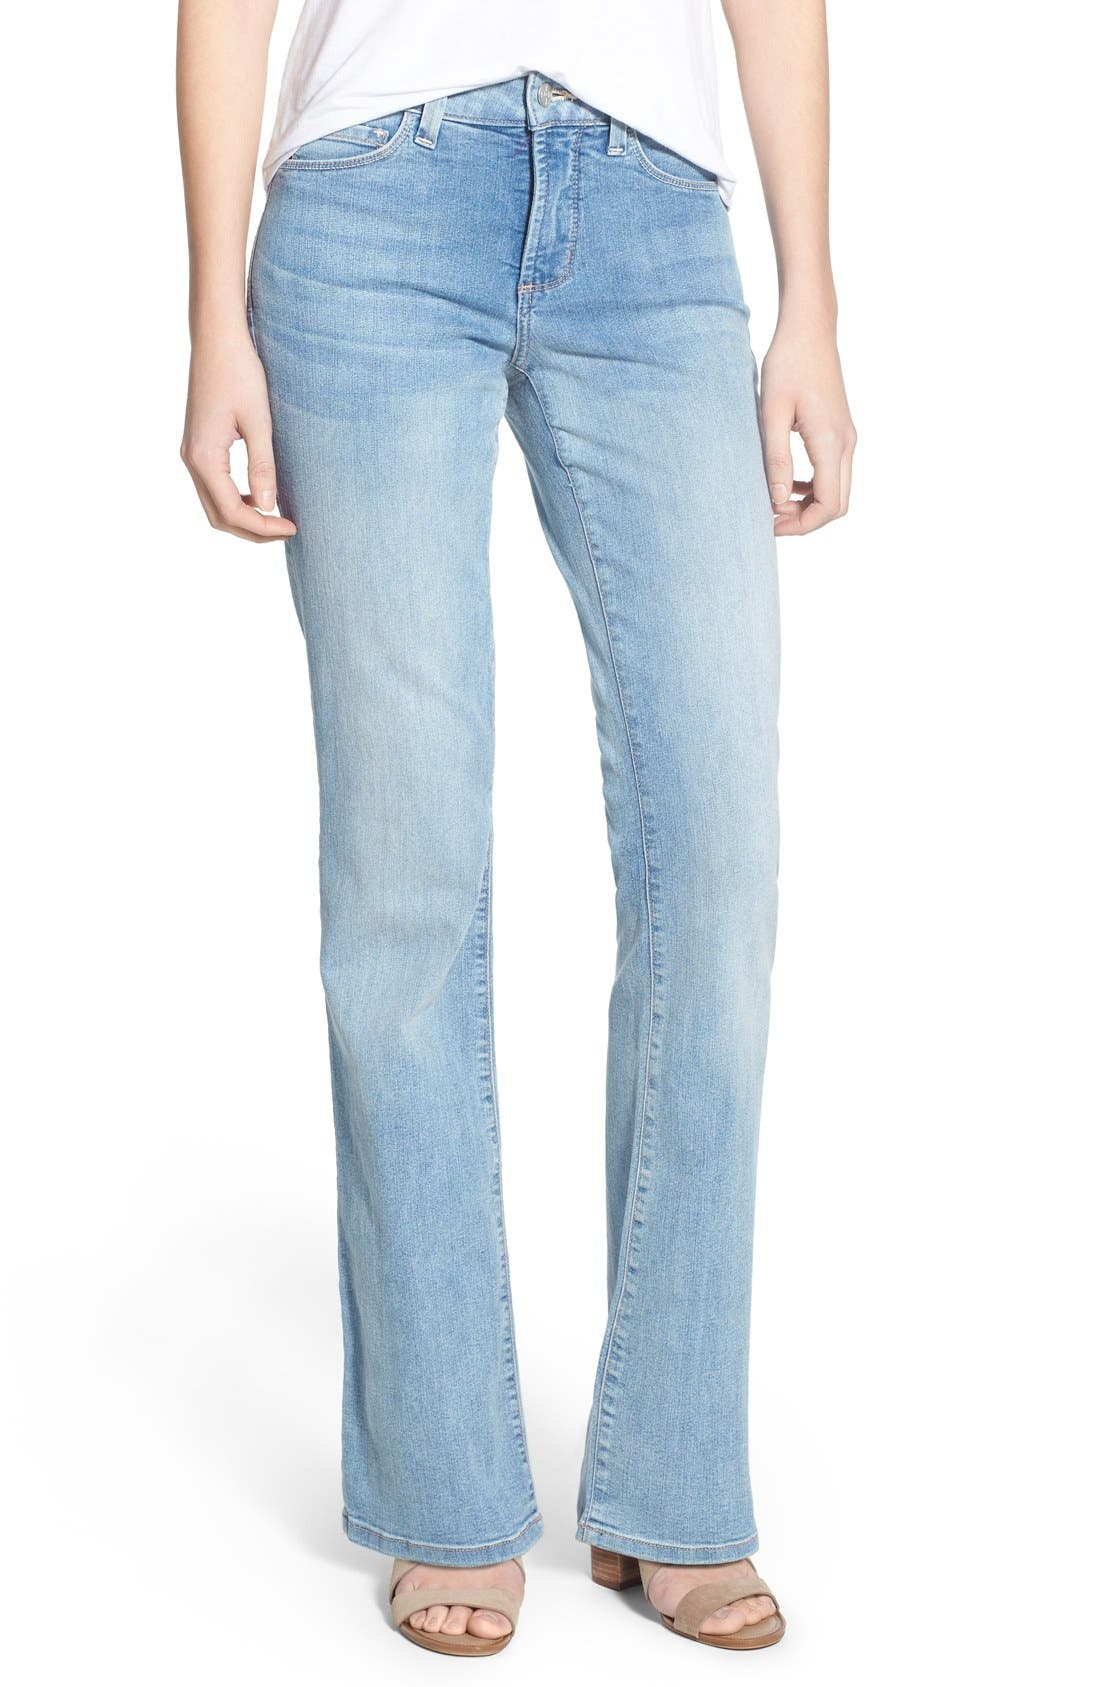 Main Image - NYDJ 'Barbara' Stretch Bootcut Jeans (Burbank) (Regular & Petite)